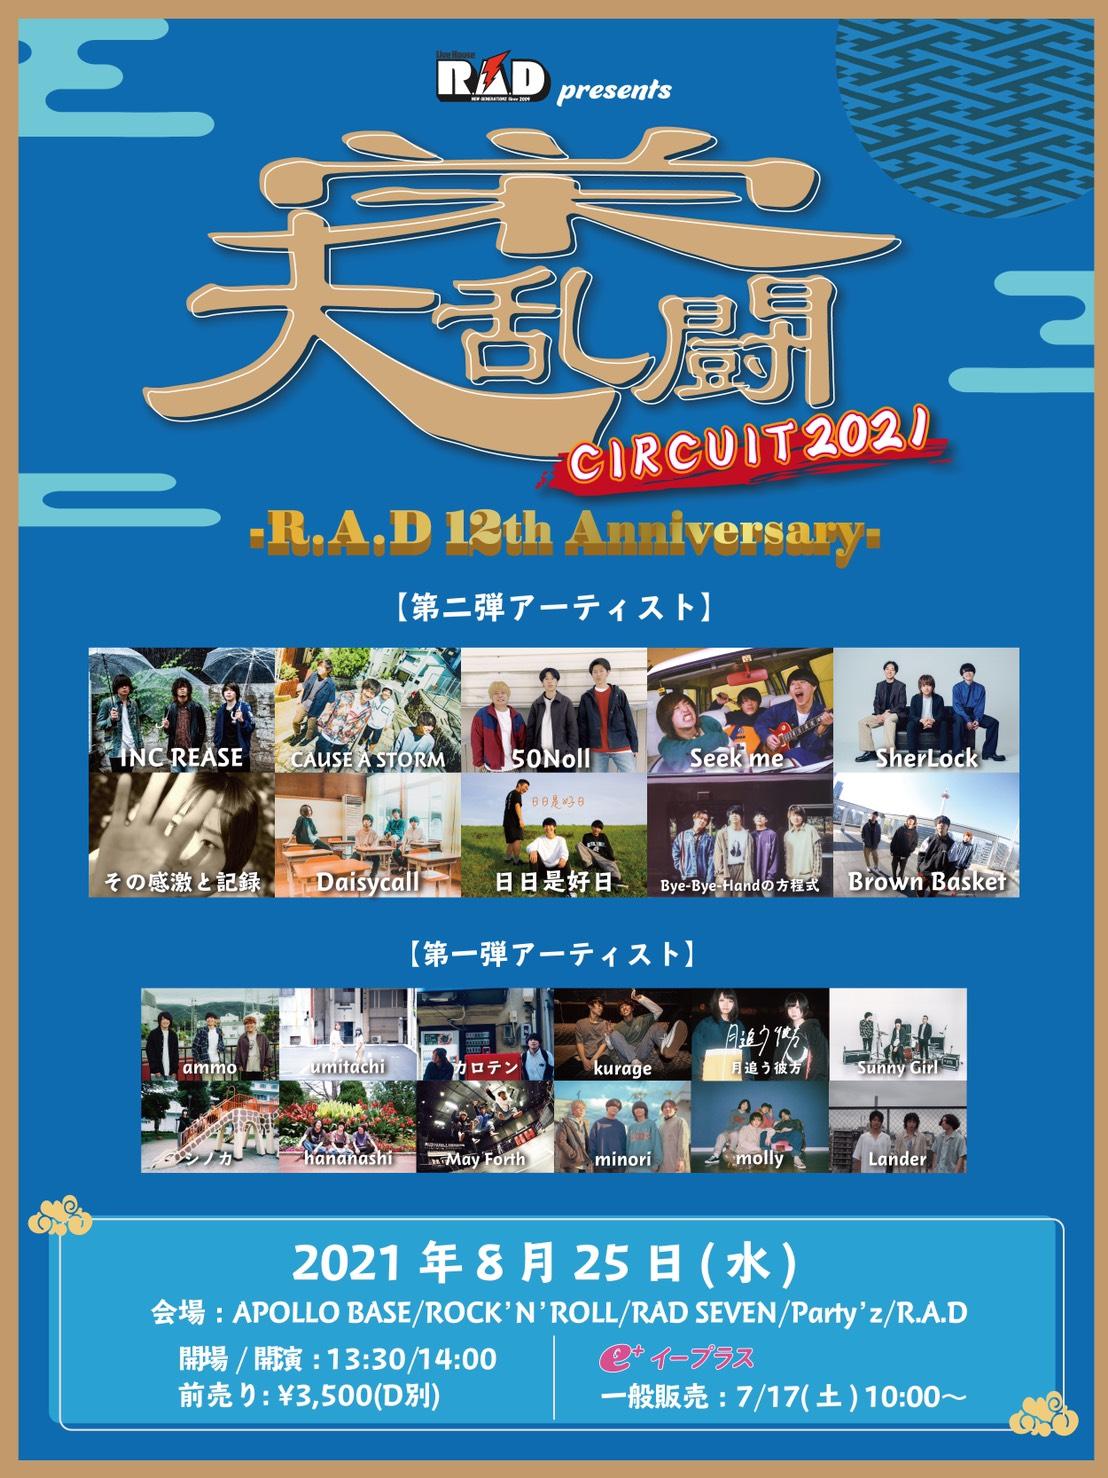 R.A.D presents 栄大乱闘CIRCUIT 2021 〜R.A.D 12th Anniversary〜